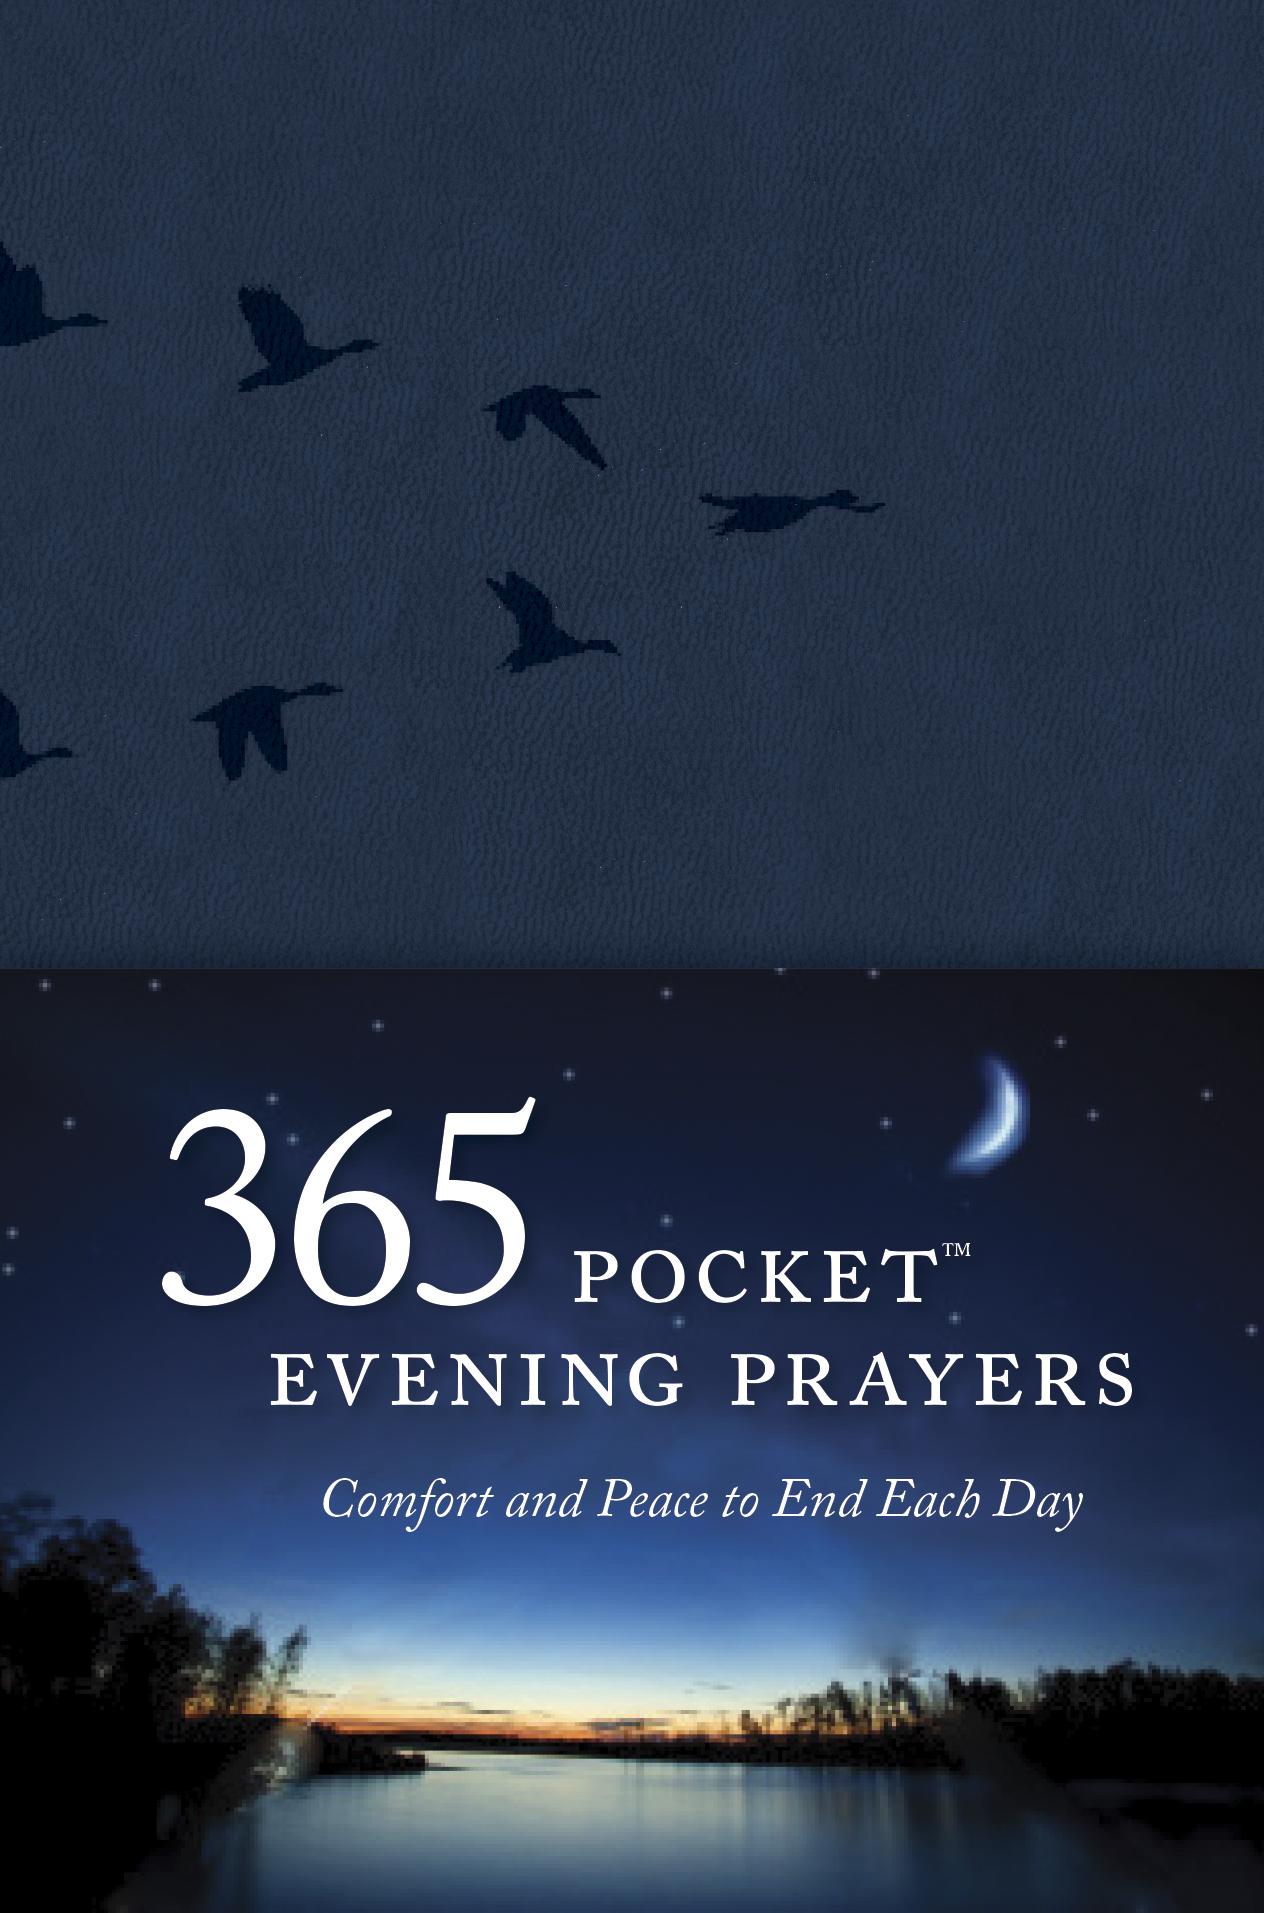 365 Pocket Evening Prayers